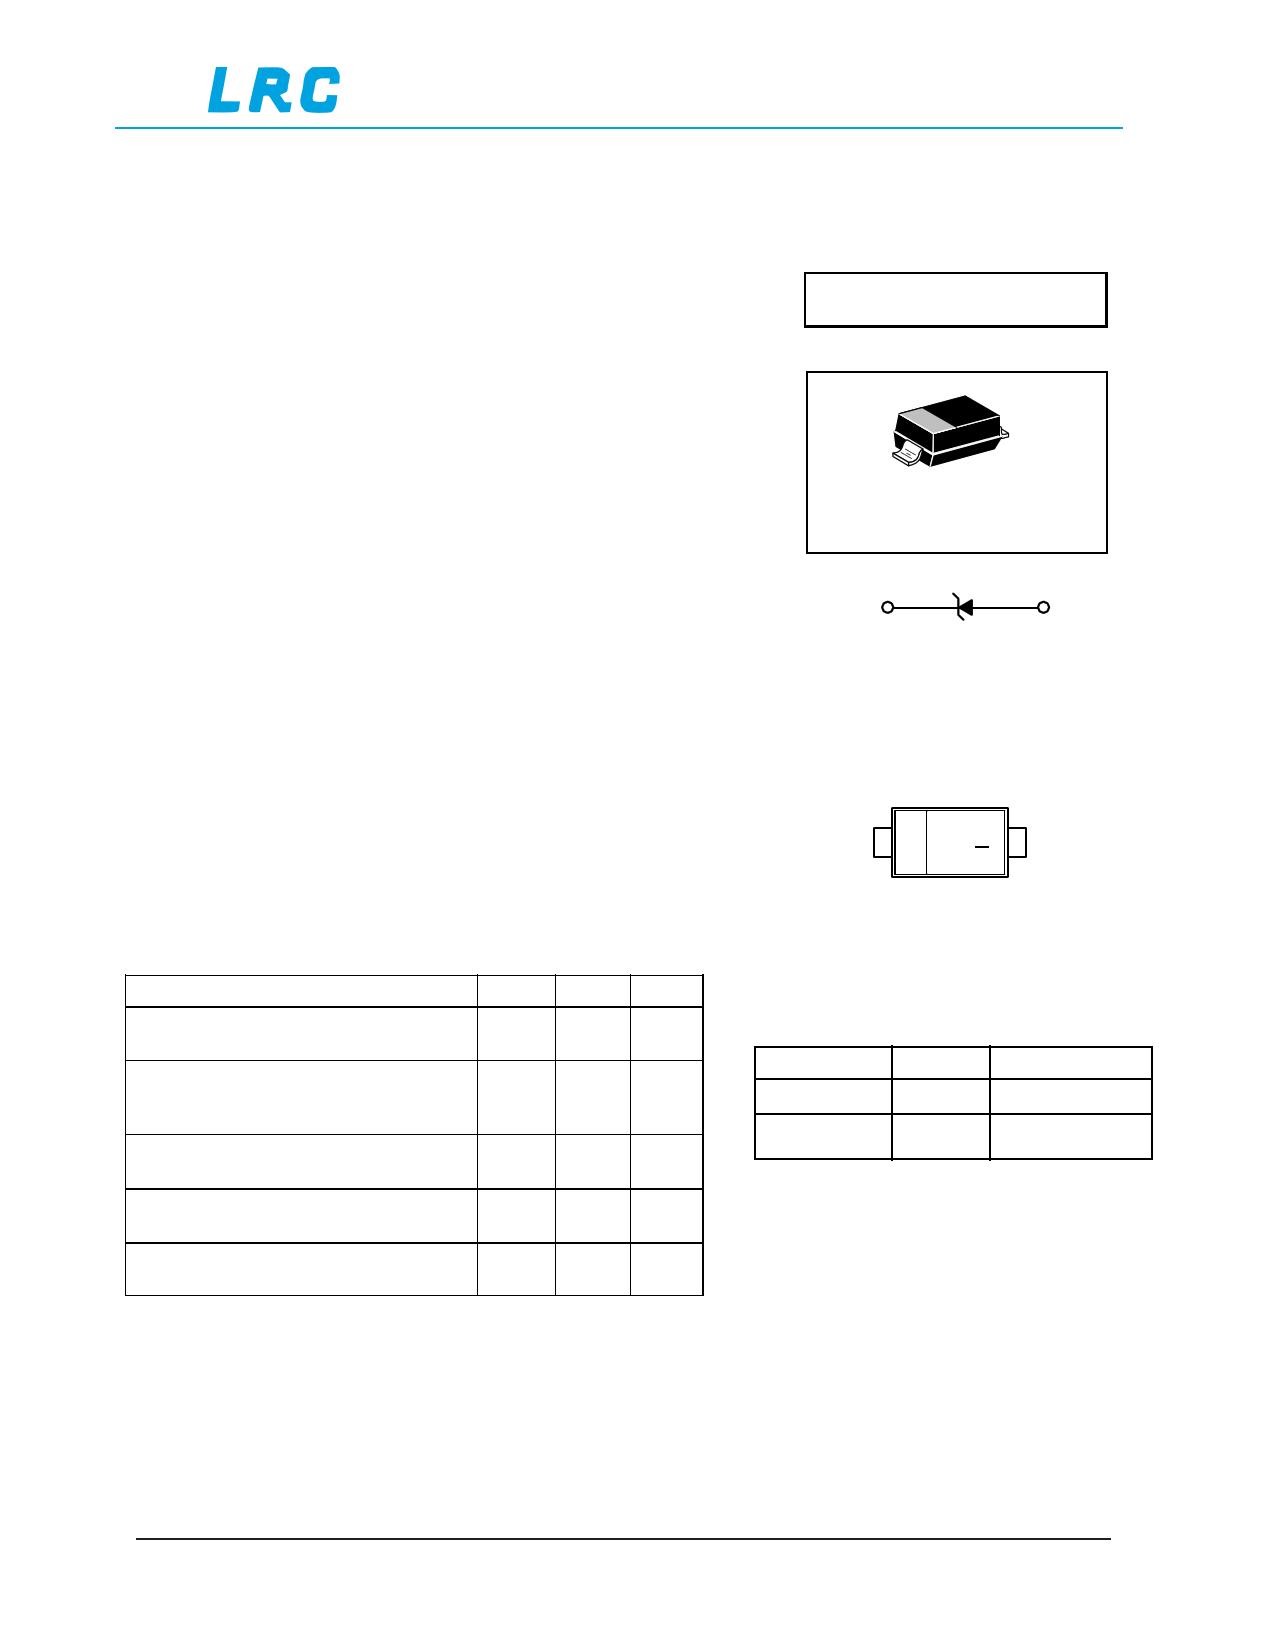 LMSZ4684ET1G datasheet, circuit